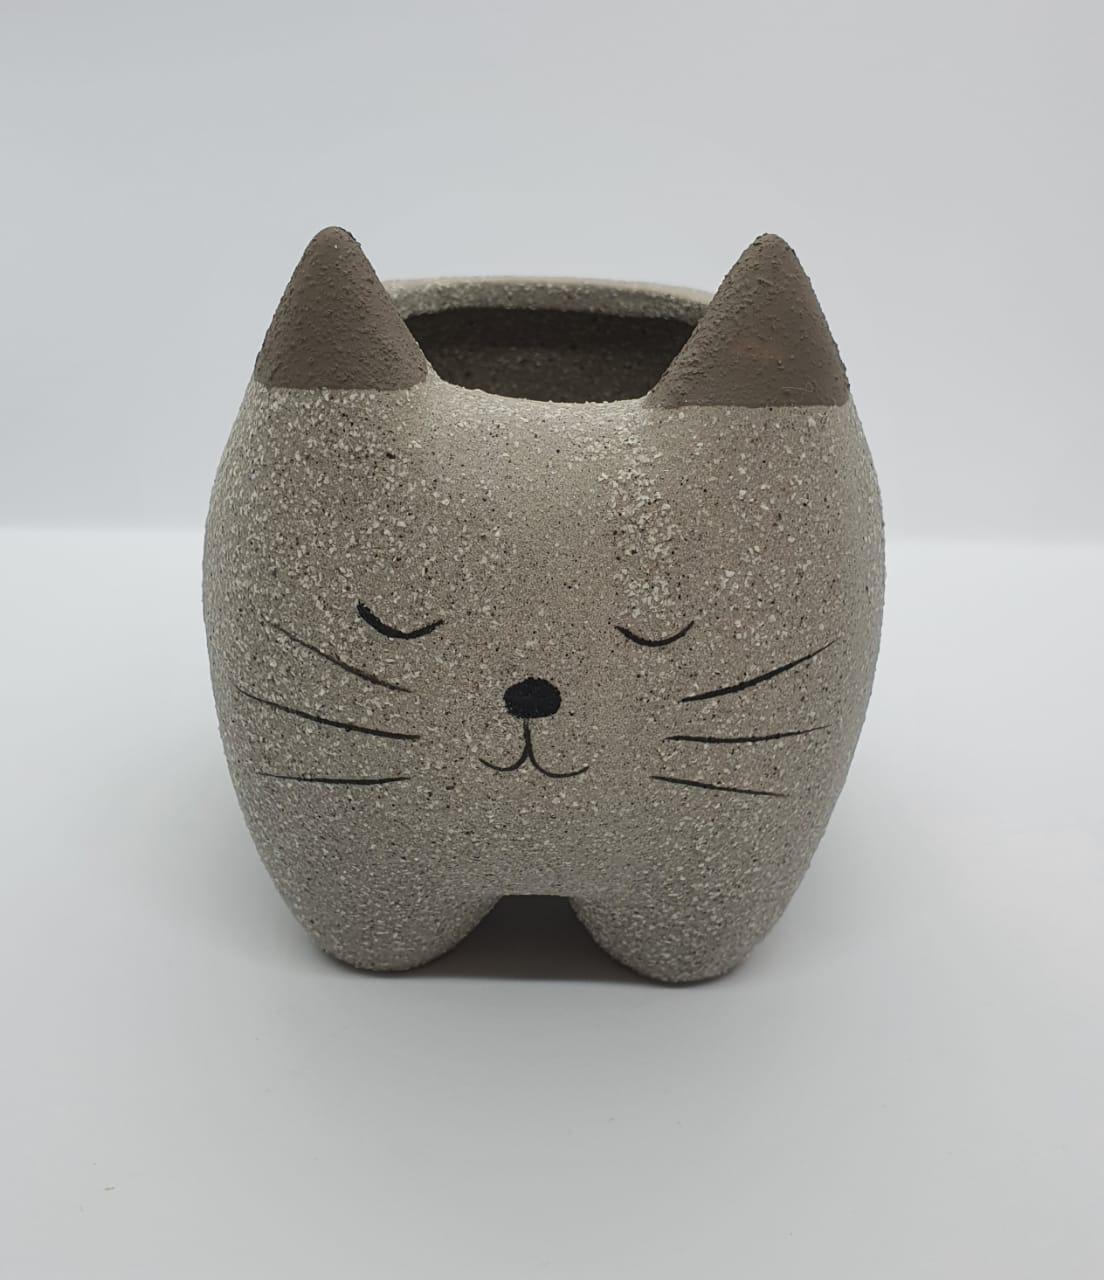 Cachepô de cerâmica cat cinza areia